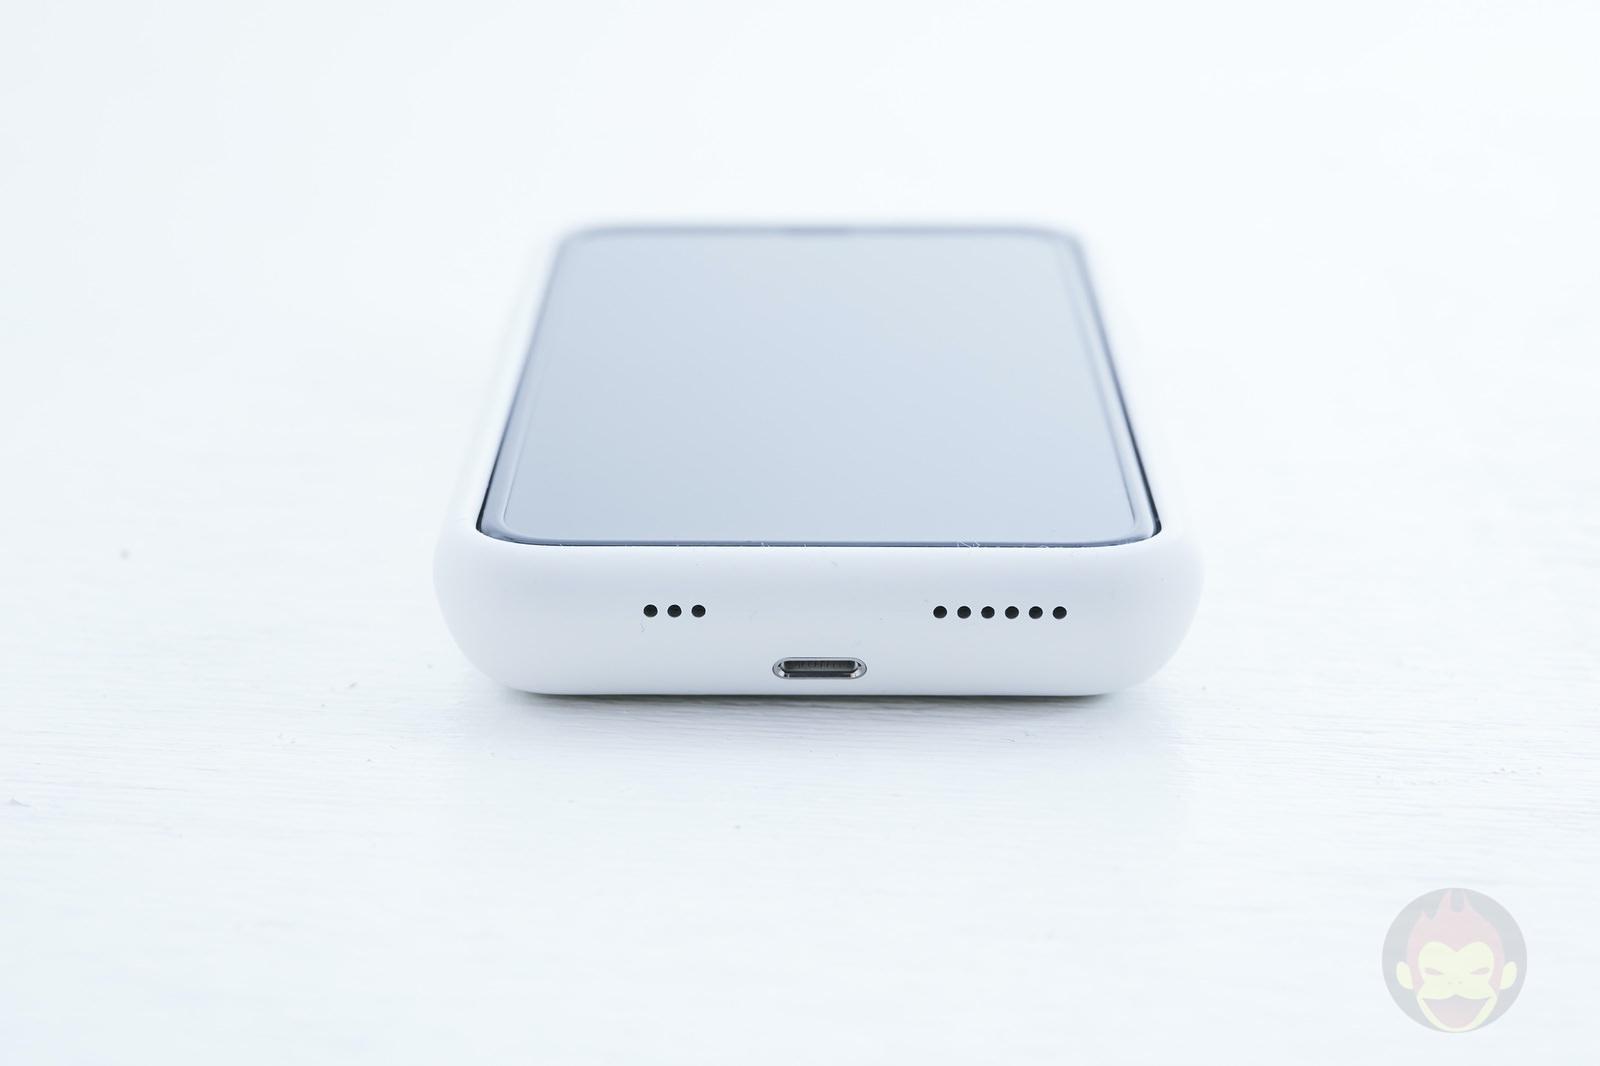 Smart-Battery-Case-for-iPhoneXS-Review-04.jpg